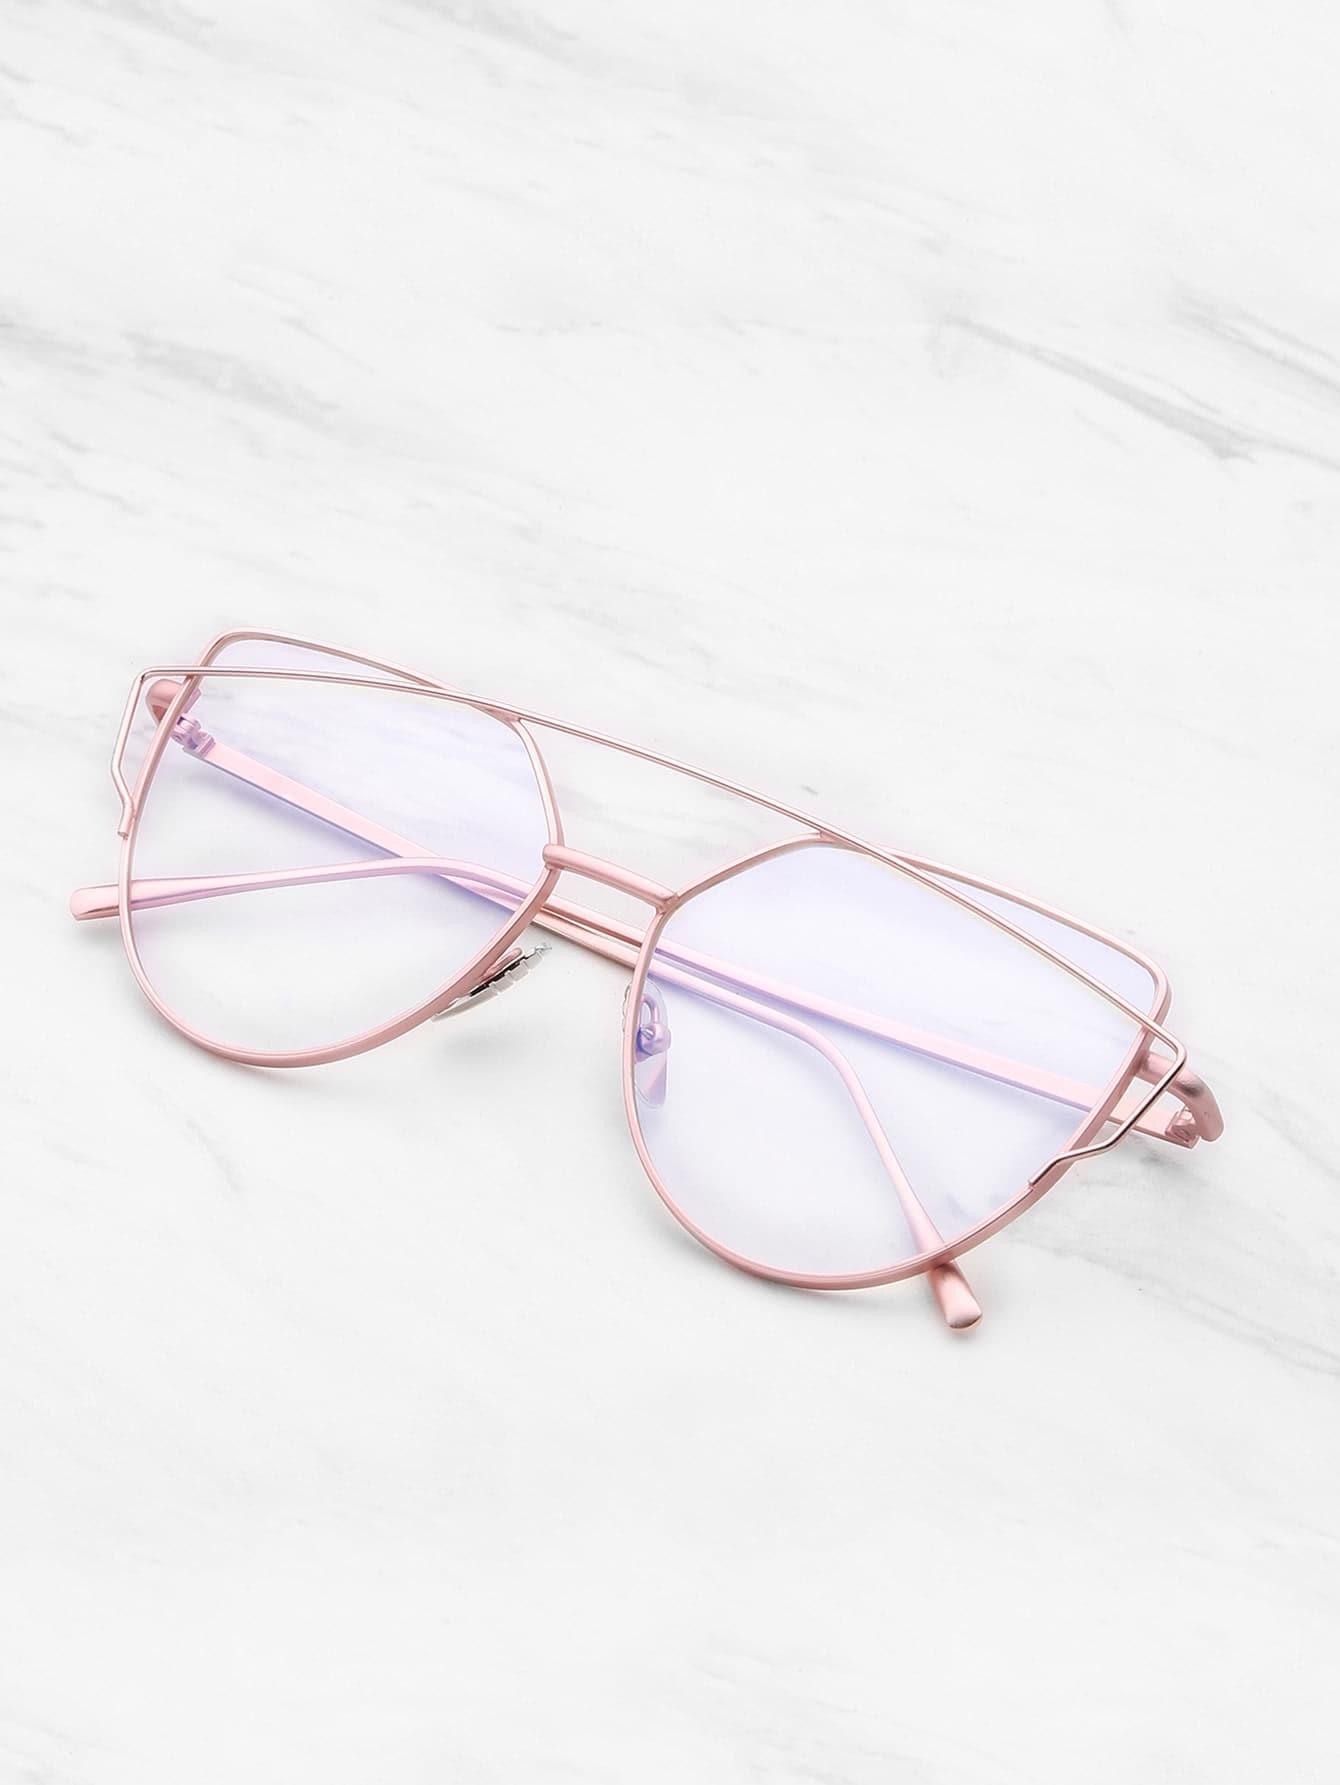 Top Bar Flat Lens Glasses sunglass170613303